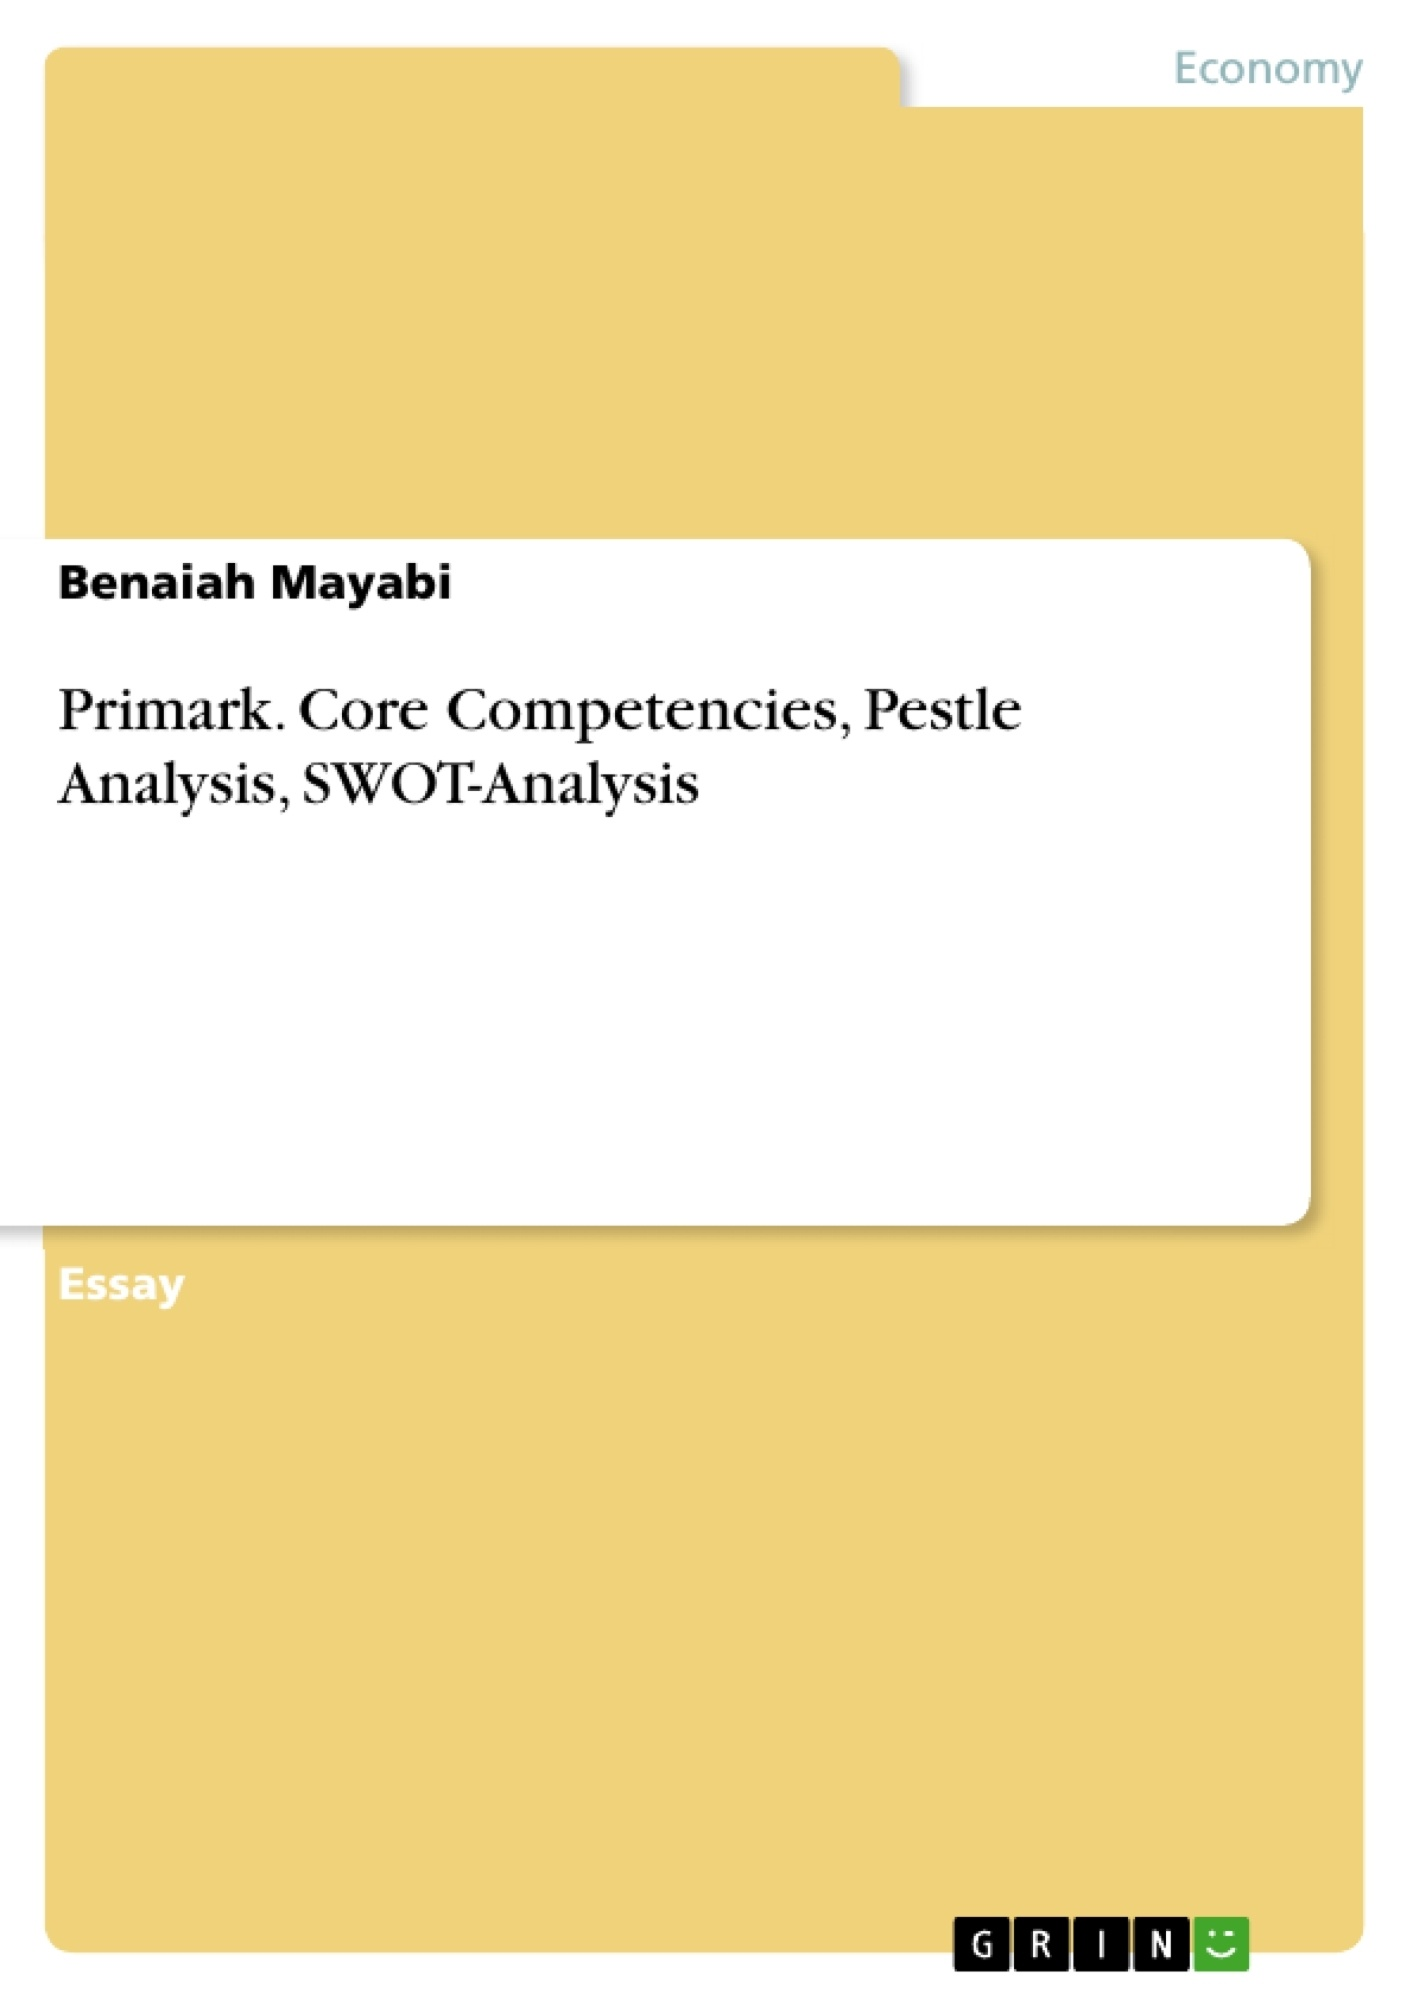 Title: Primark. Core Competencies,  Pestle Analysis, SWOT-Analysis